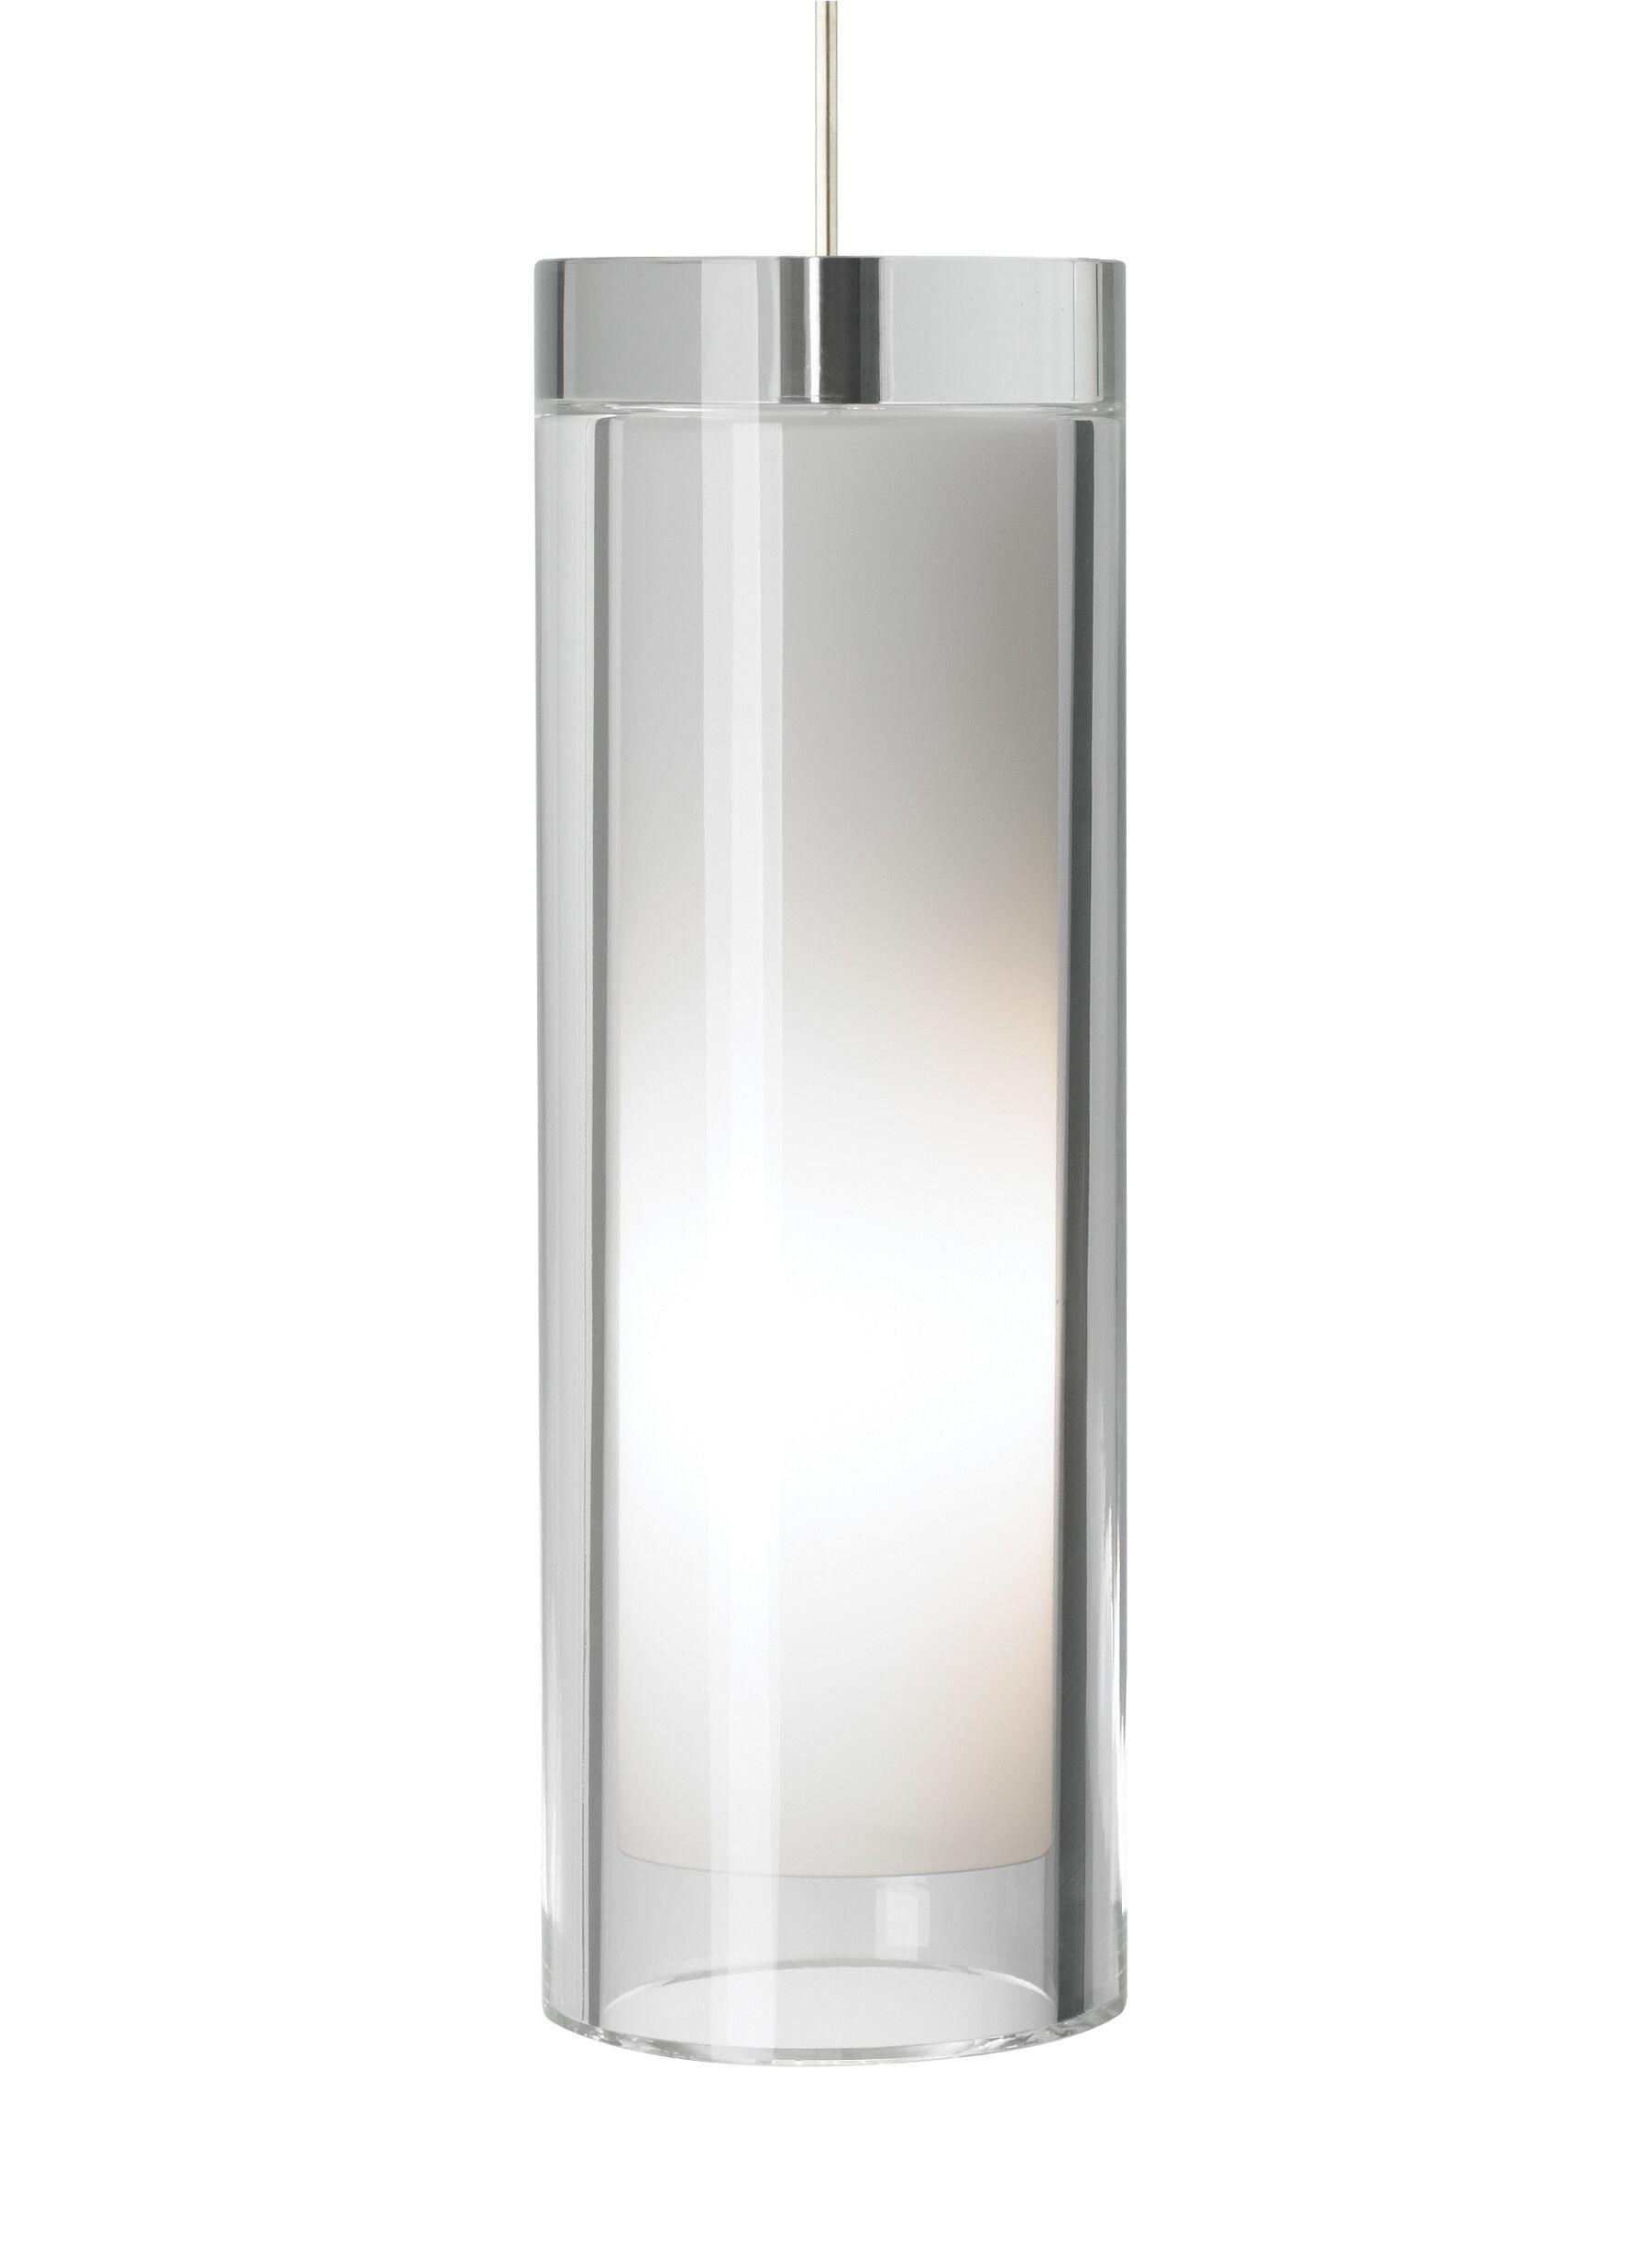 Sara Grande 1-Light Cylinder Pendant Finish: Bronze, Shade Color: Clear, Bulb Type: 1 x 32W 120V Fluorescent